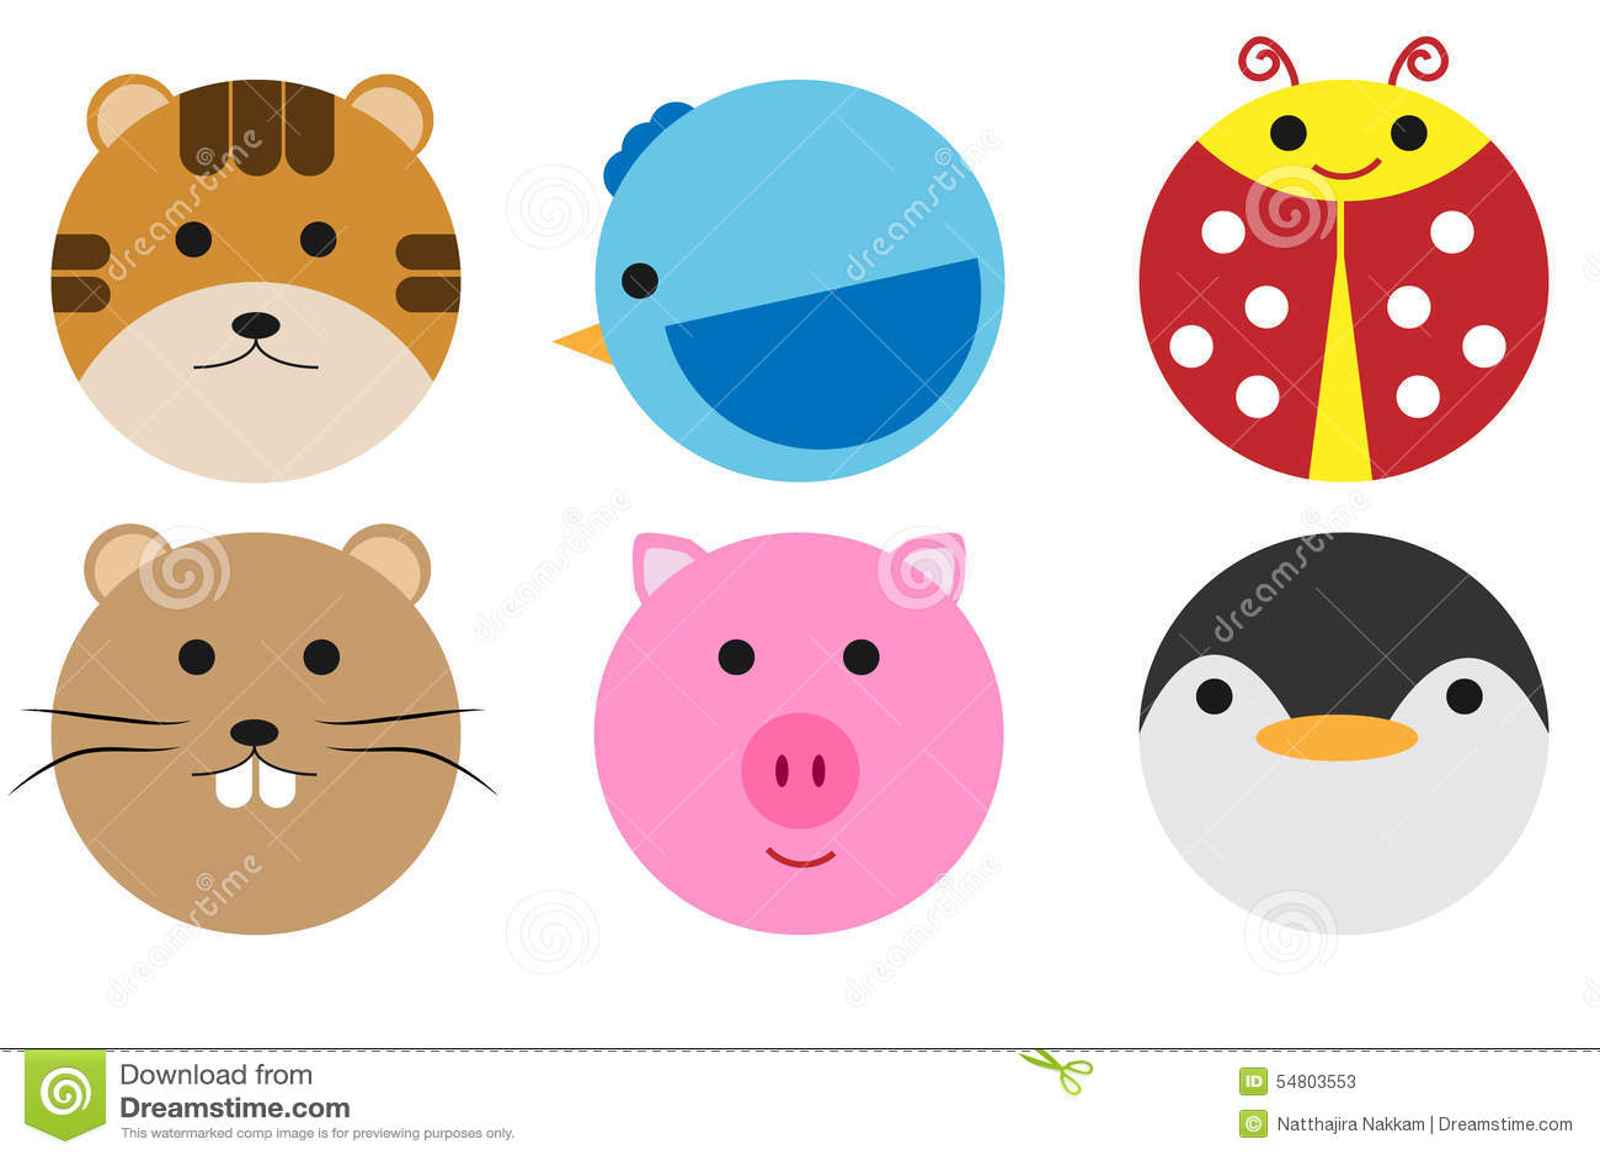 Animals circle stock vector. Illustration of cartoon ...